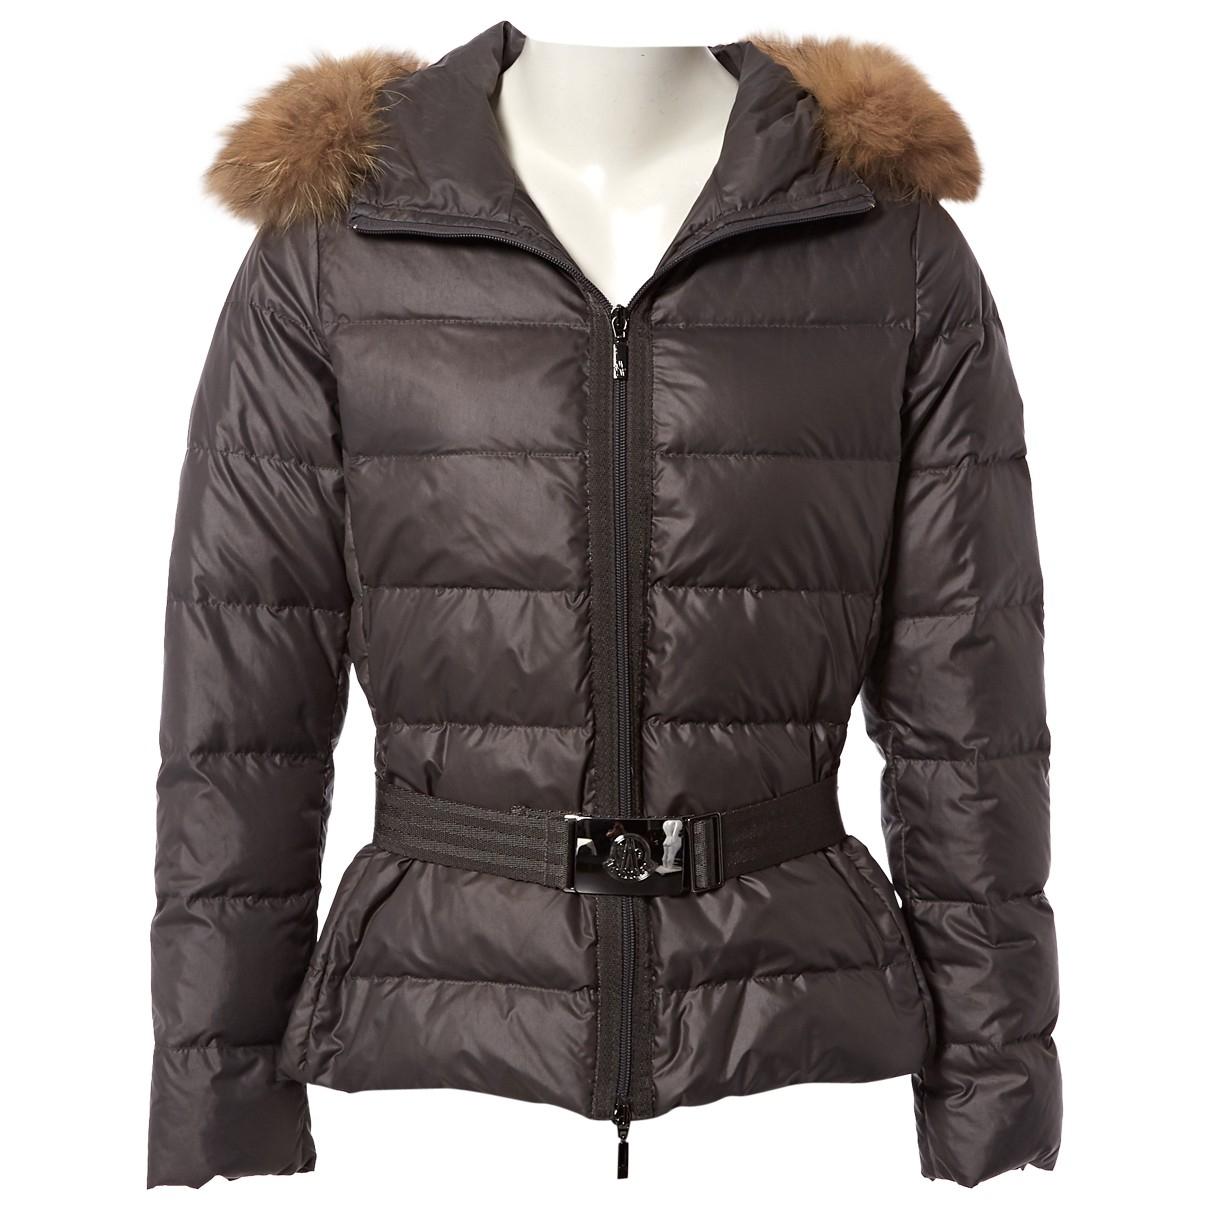 Moncler \N Grey coat for Women 1 0-5